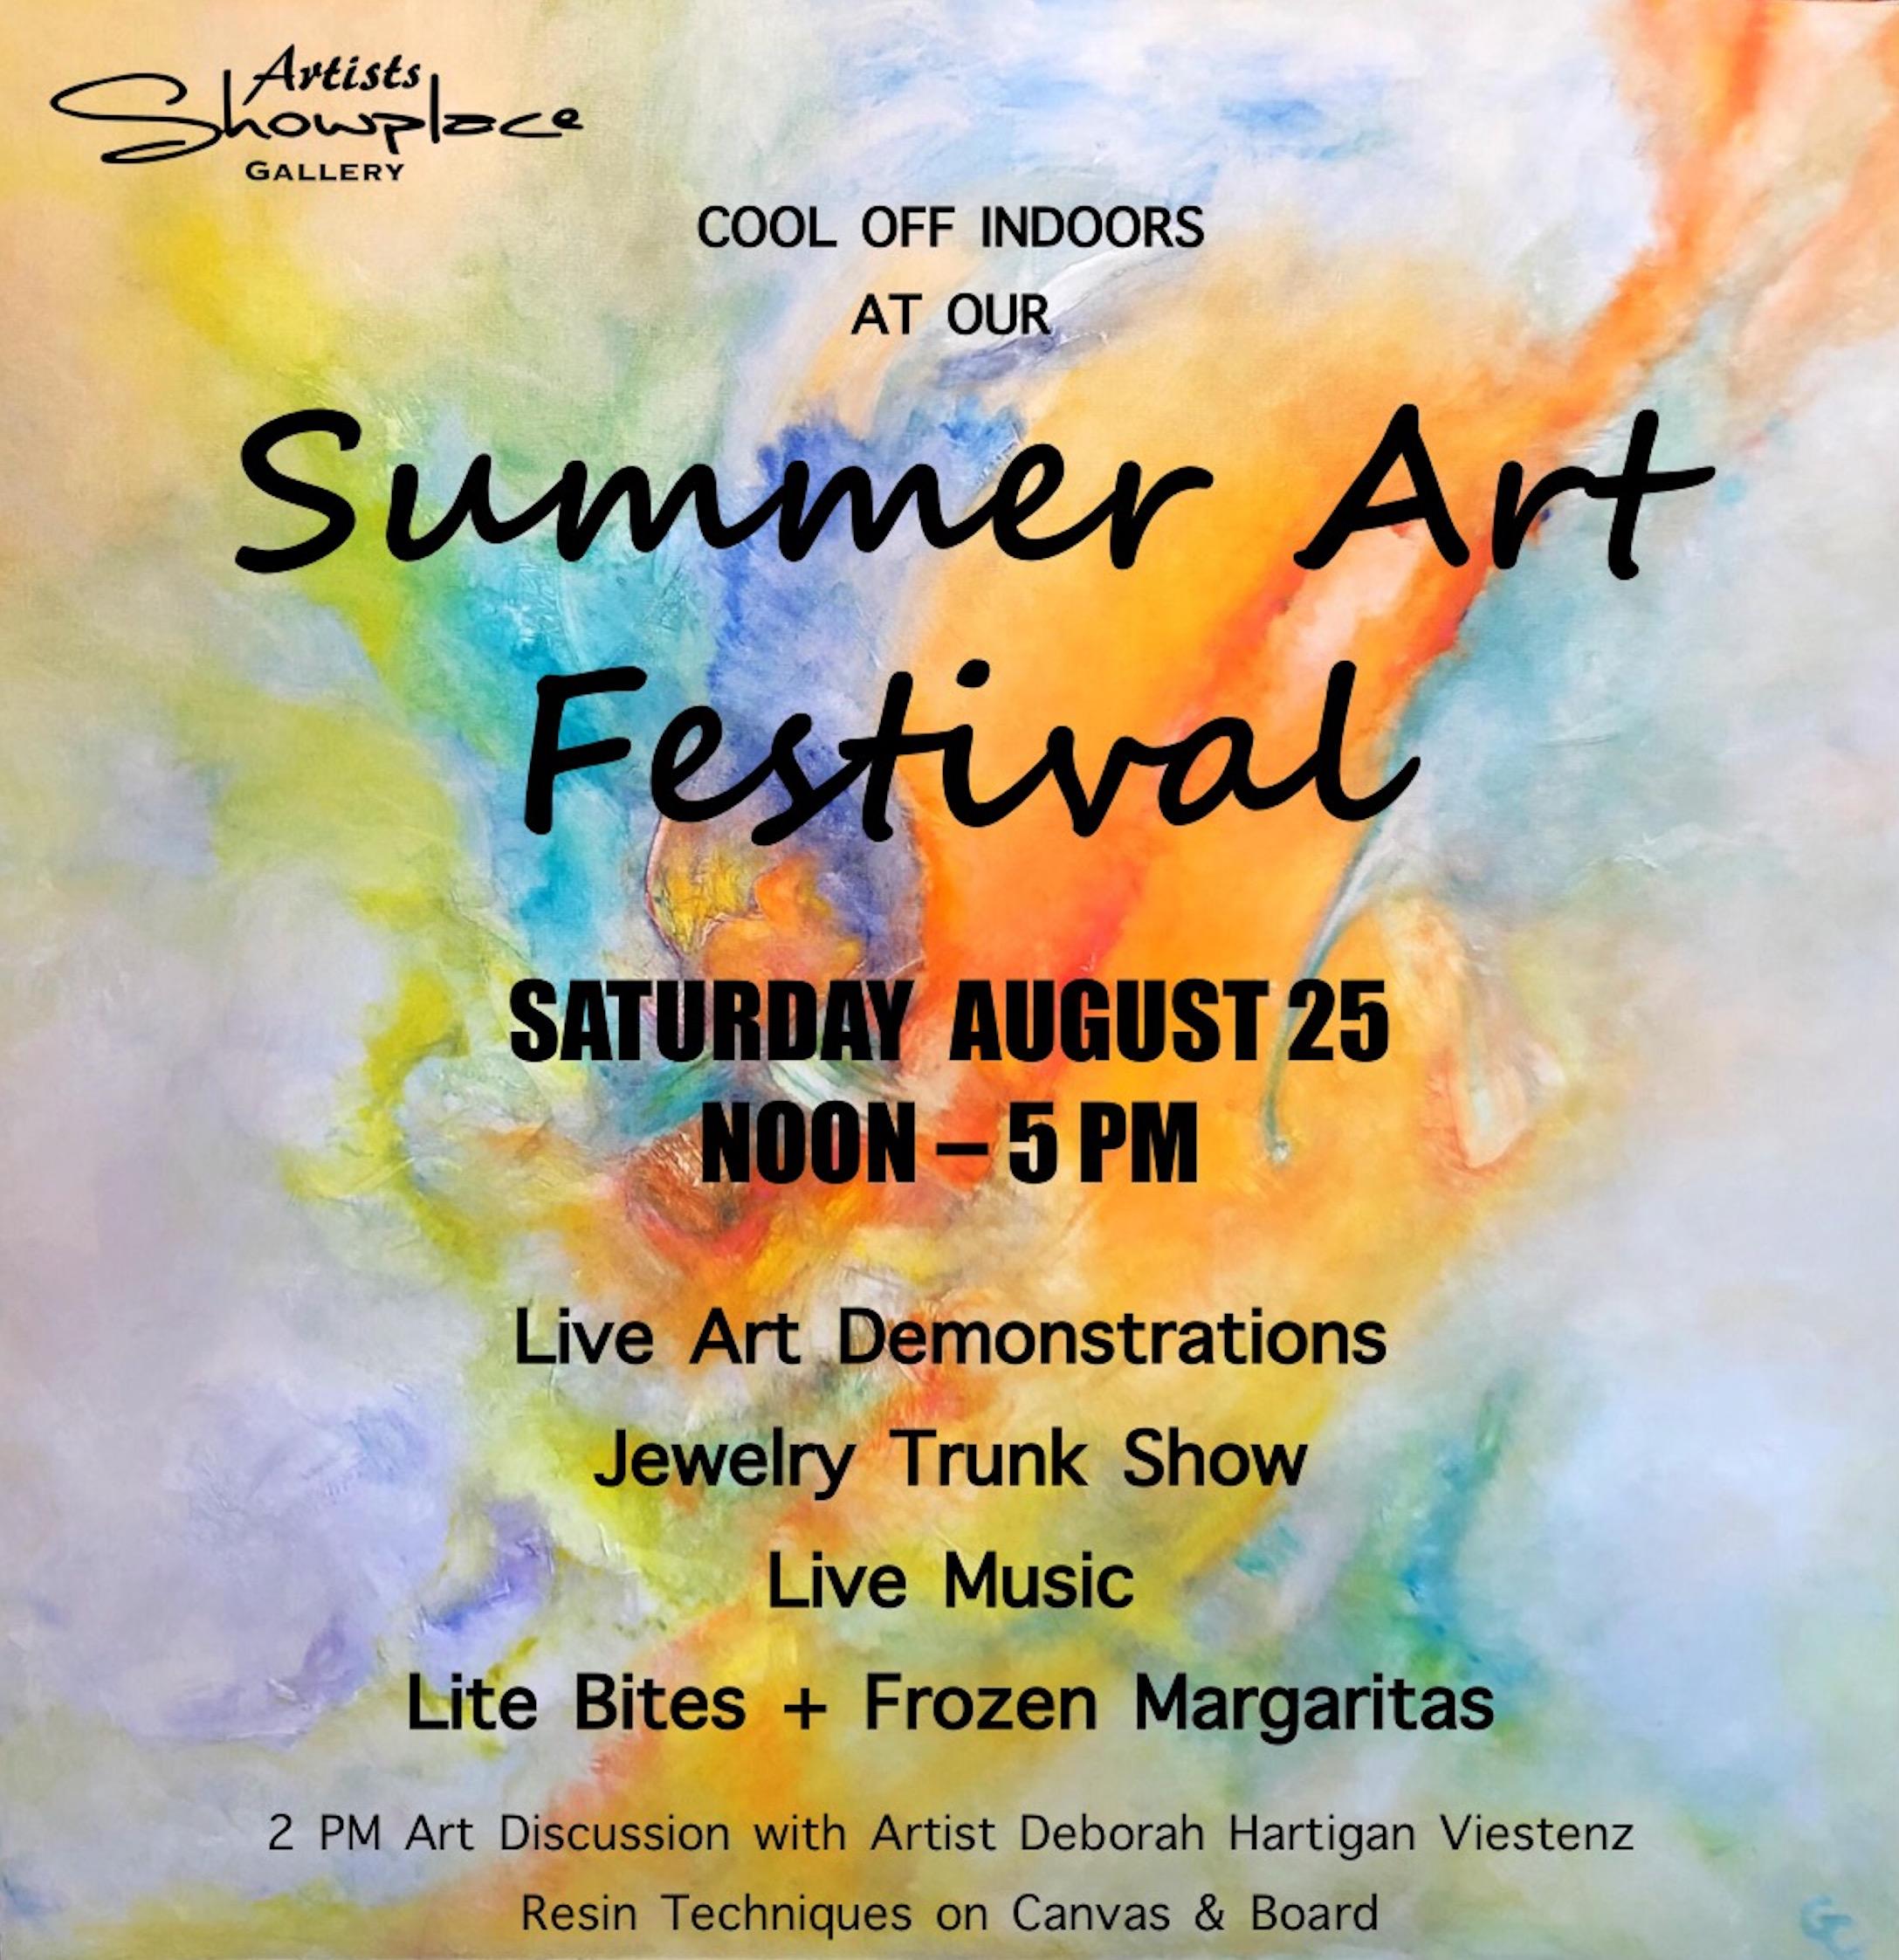 Summer Art Festival Color Ad UPDATED JPEG.jpg